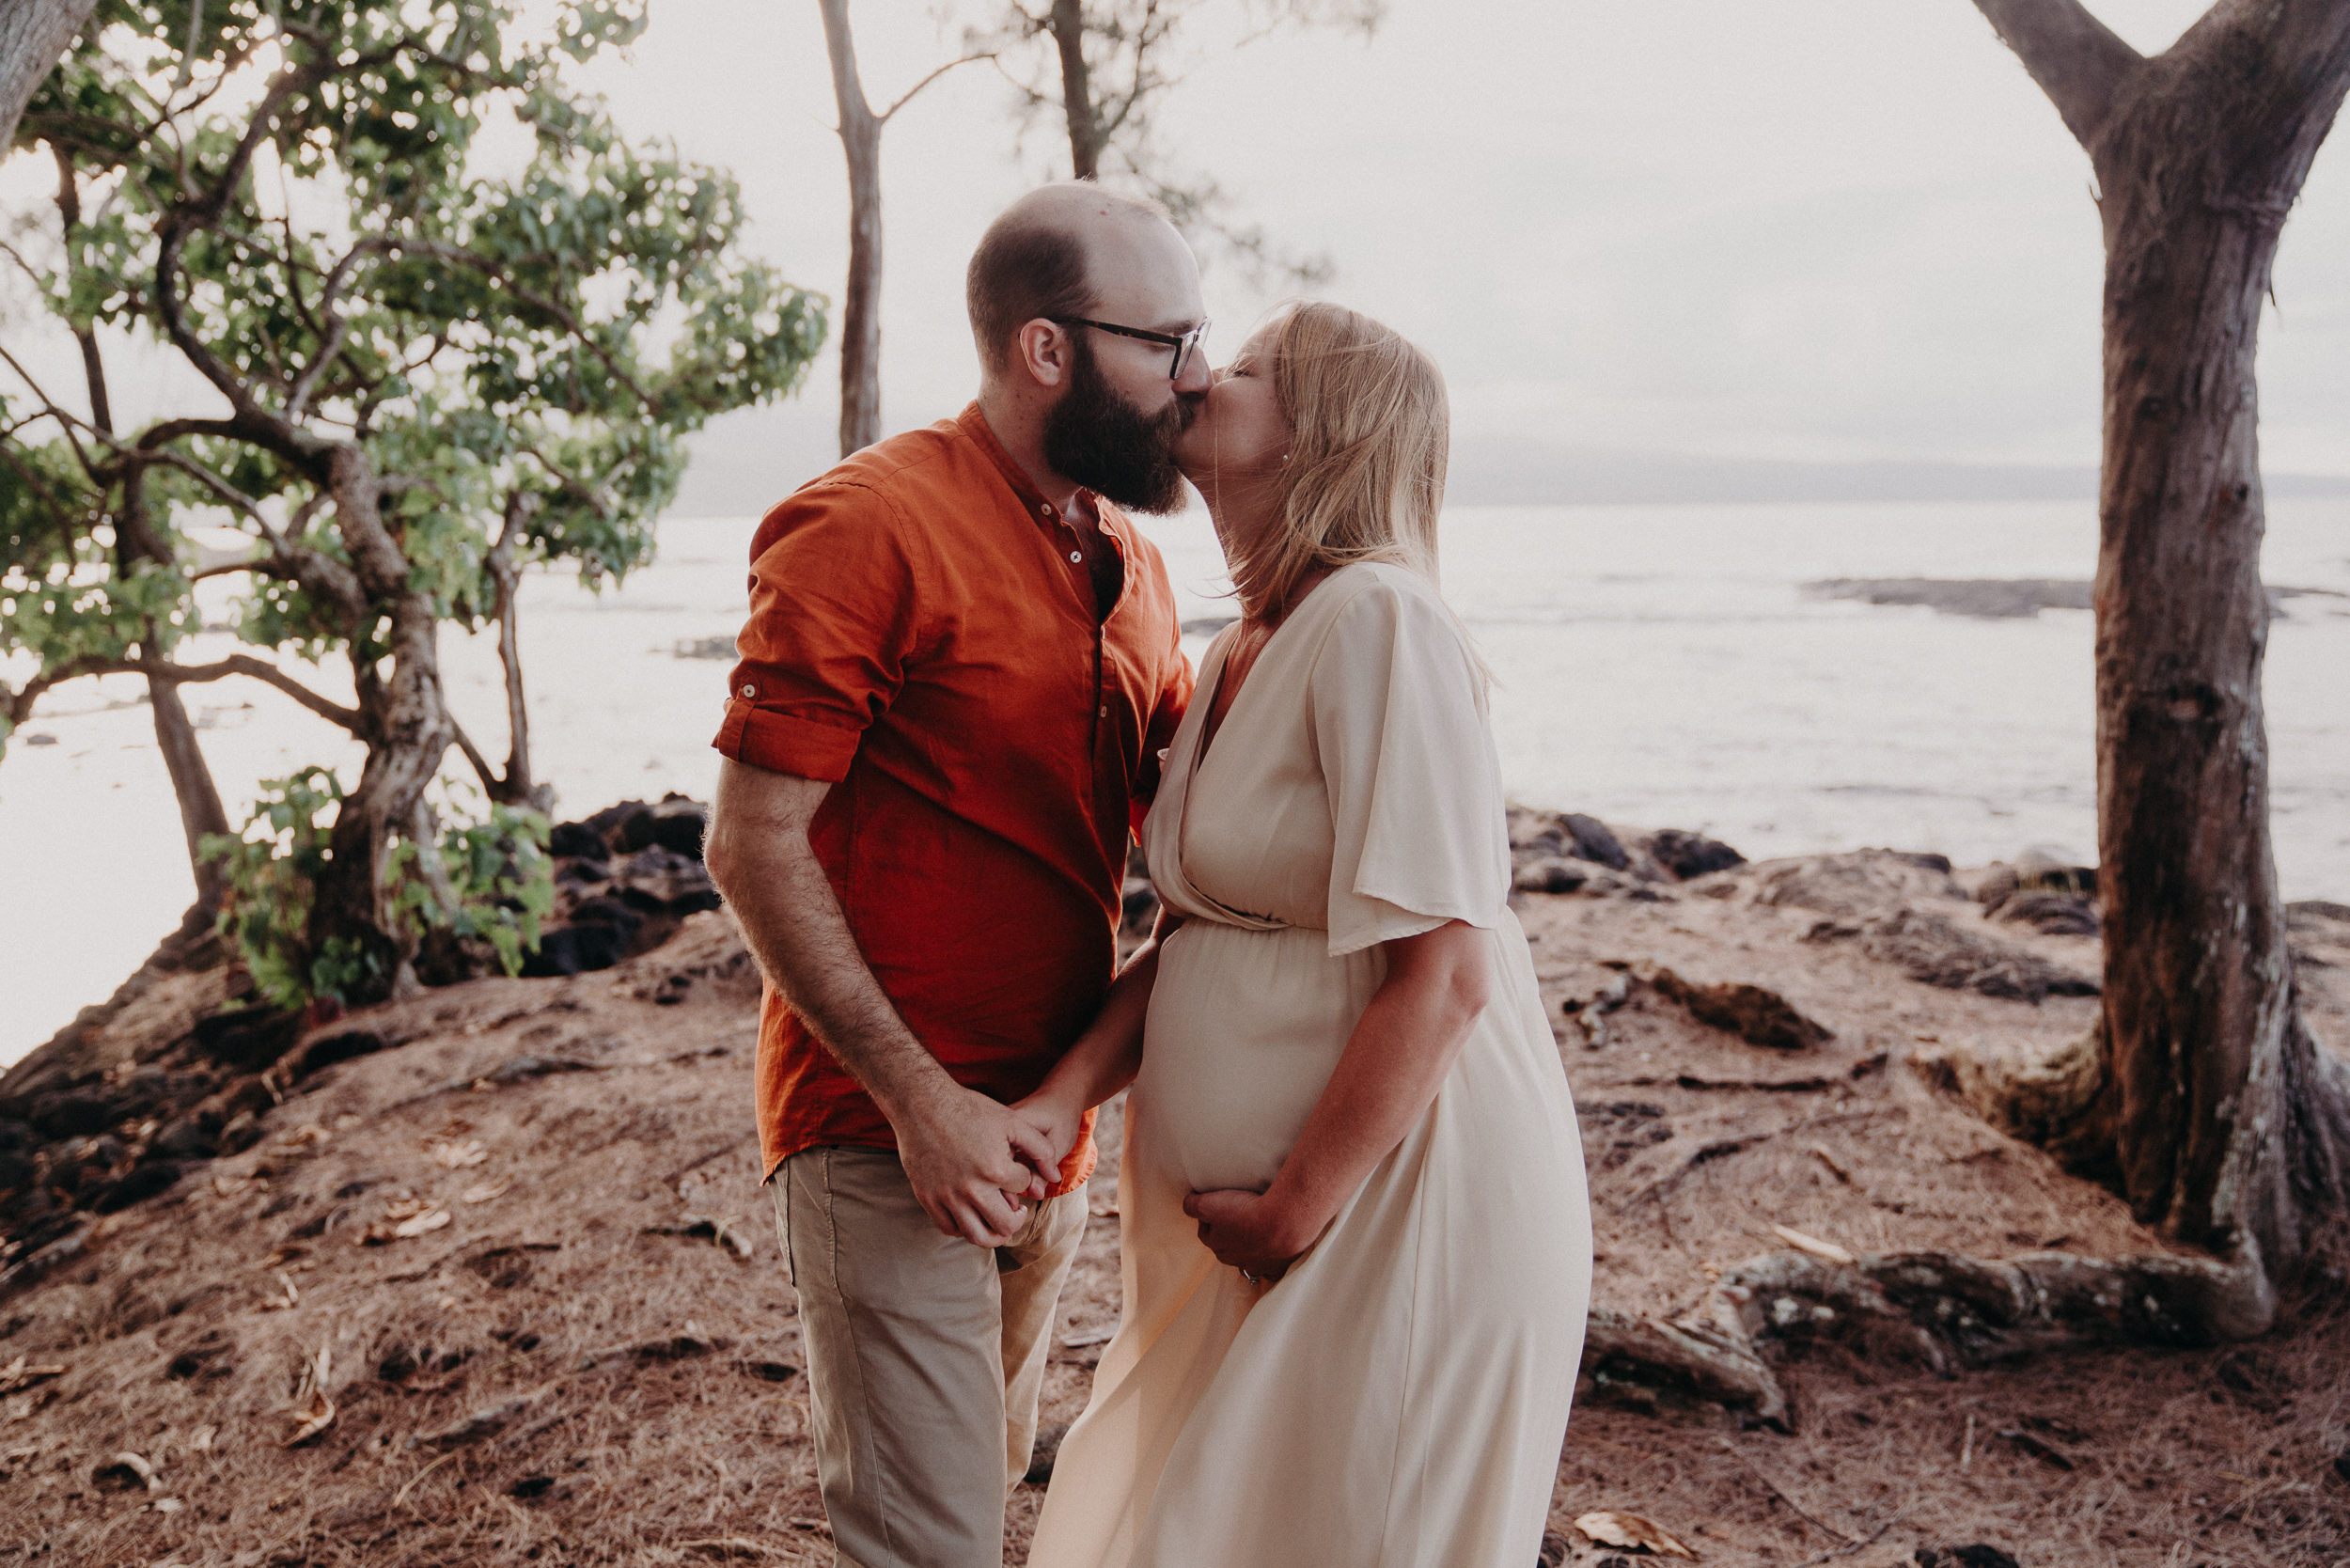 Sonia Primerano Photography Hawaii Hilo Kona Big Island Weddings Elopements Maternity Destination Adventure Couples